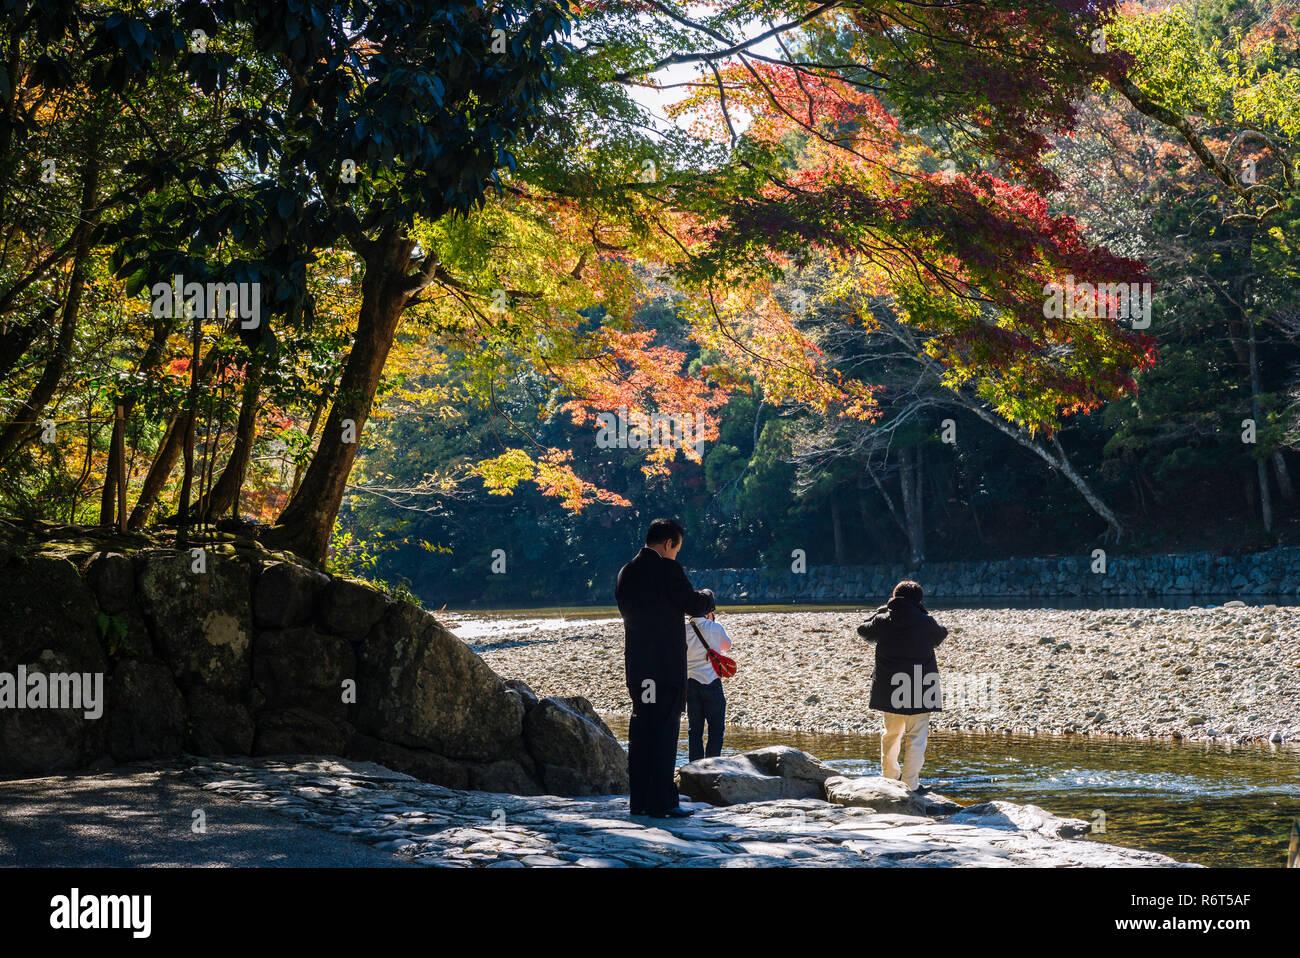 Ise Grand Shrine, Mie Prefecture, Japan: Pilgrims at Isuzu river, where ritual washings are done before entering the Inner Shrine (Naiku) - Stock Image